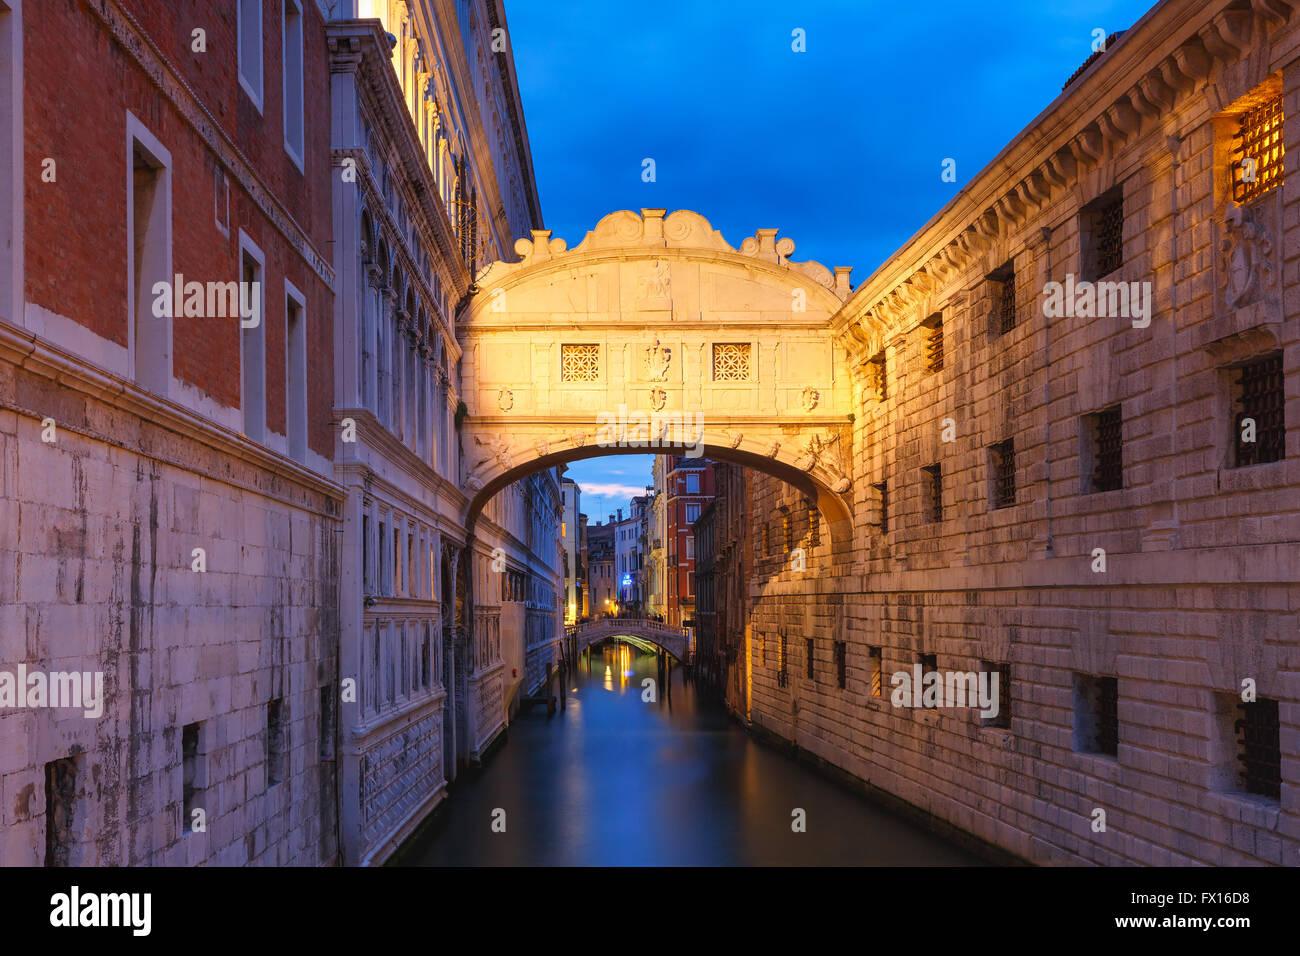 Bridge of Sighs or Ponte dei Sospiri in Venice Stock Photo